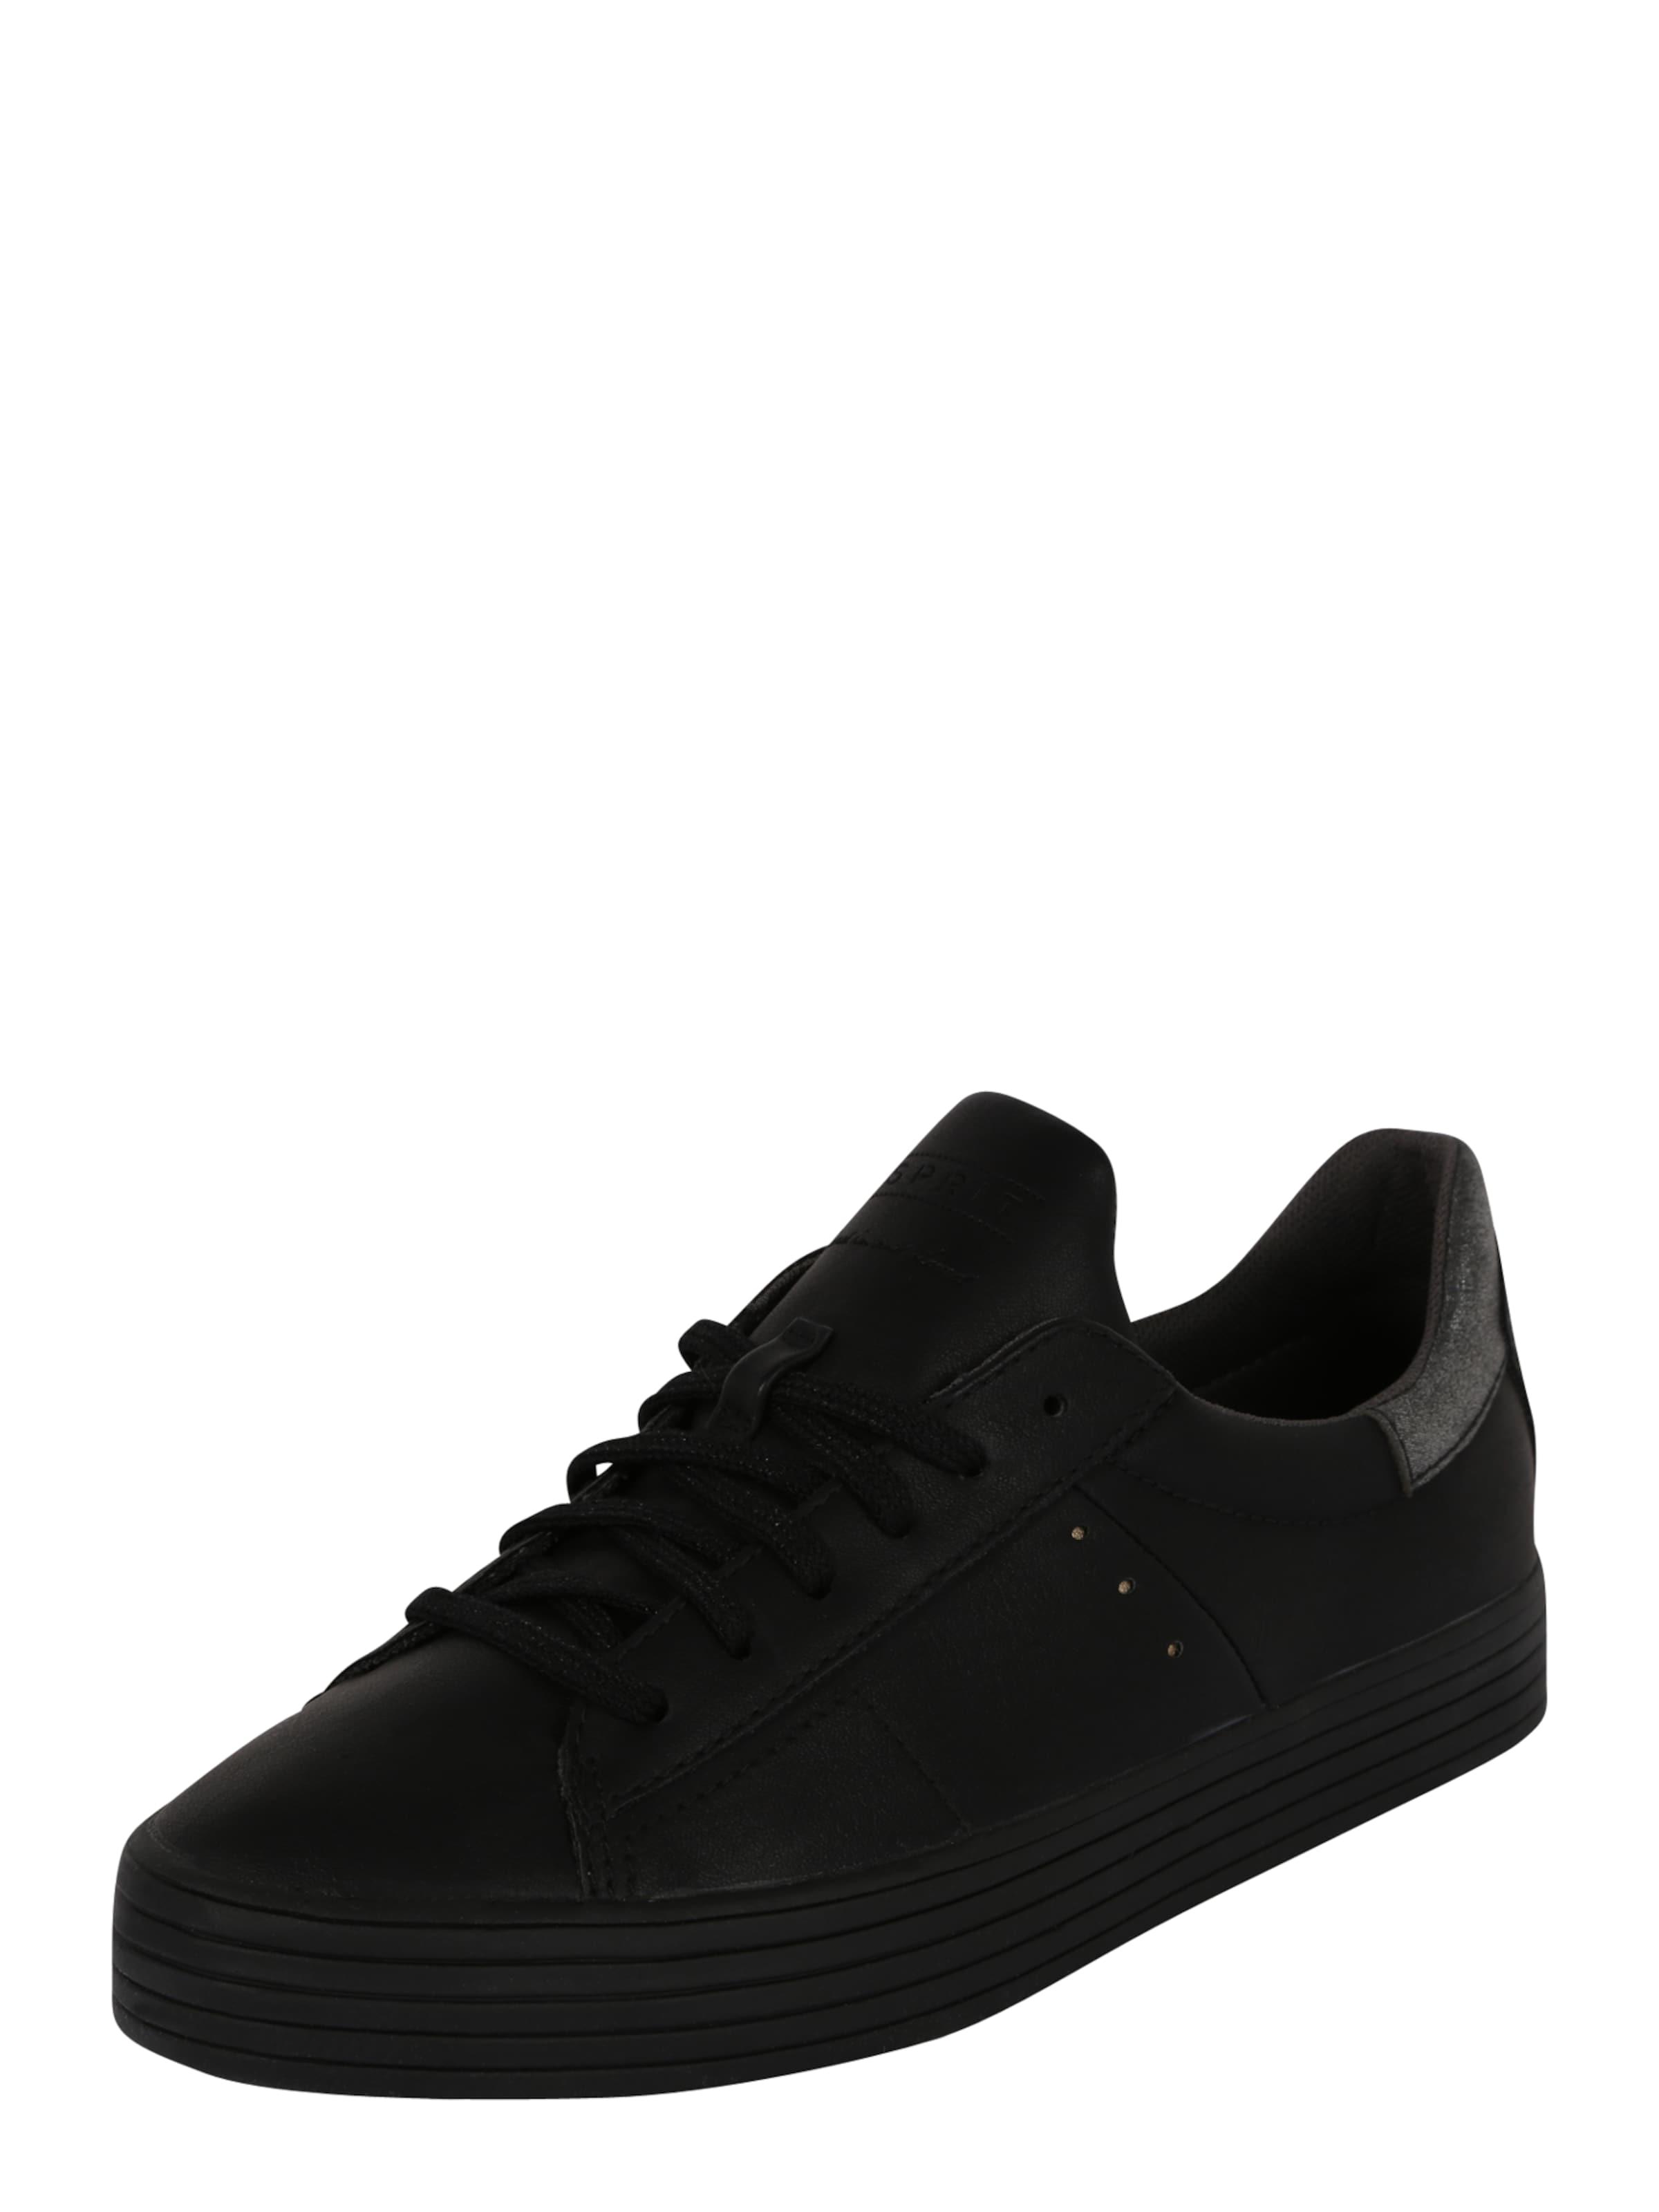 ESPRIT Sneaker Sita Lace up Hohe Qualität